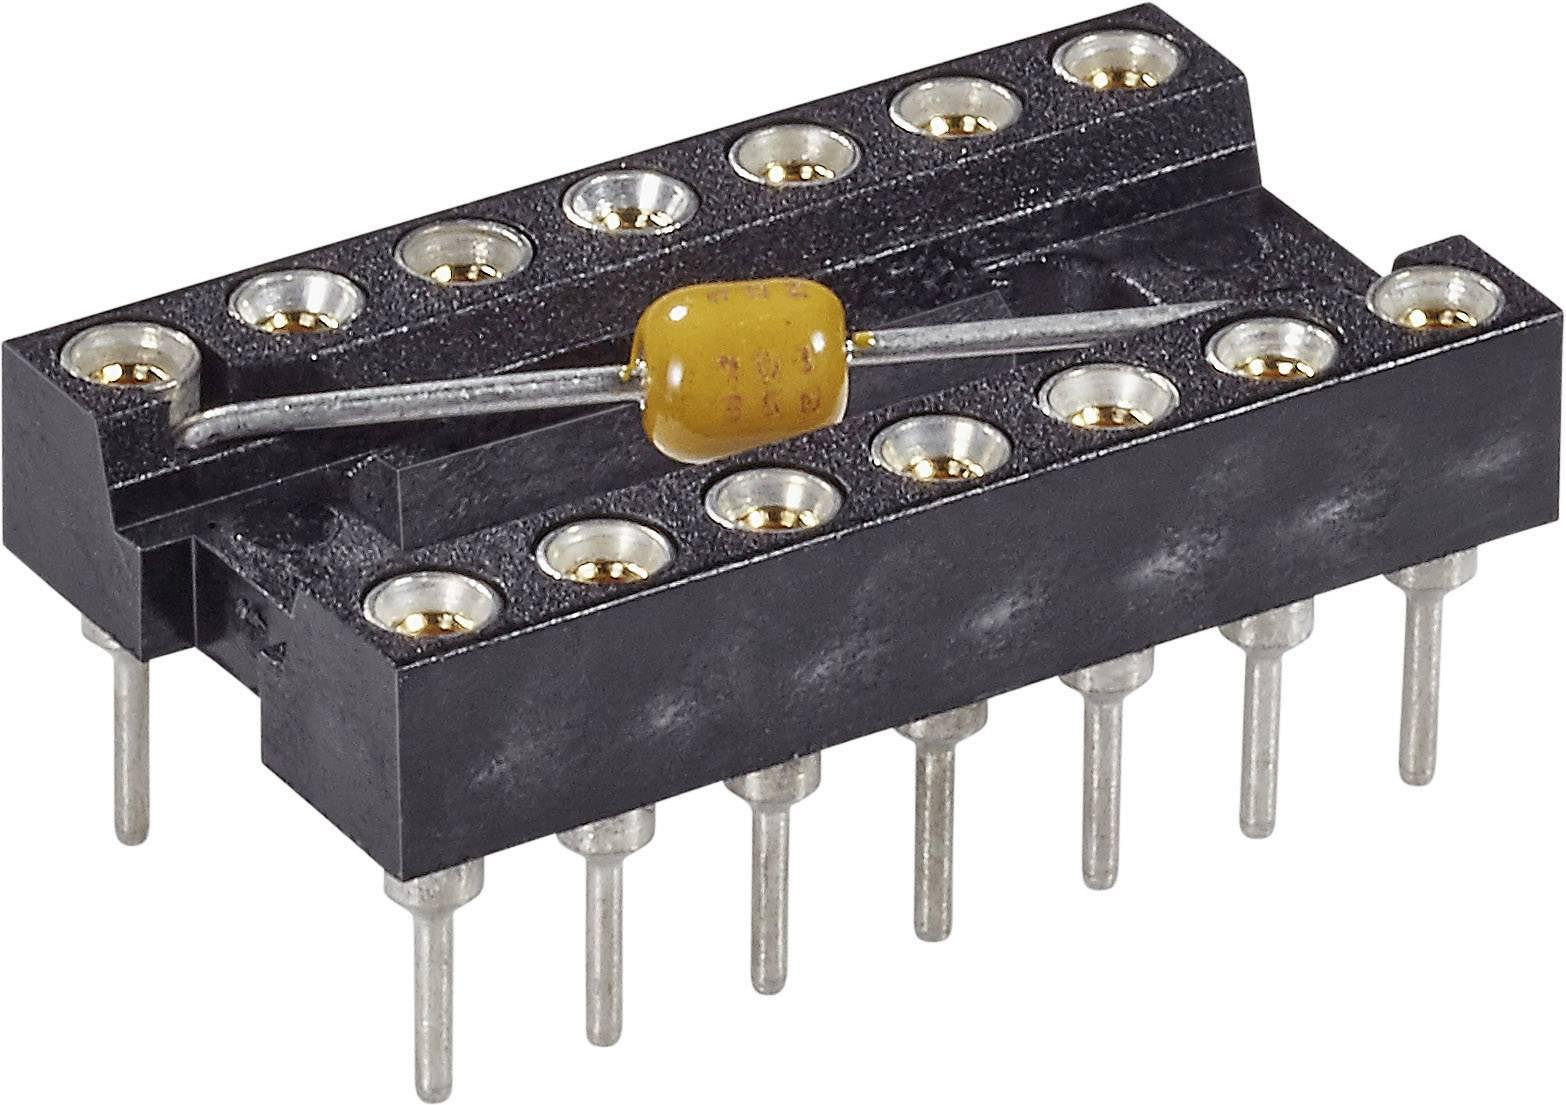 IC pätica MPE Garry MPQ 24.3 STG B 100 nFU presné kontakty, s kondenzátorom, rozteč 7.62 mm, pólů 24, 1 ks